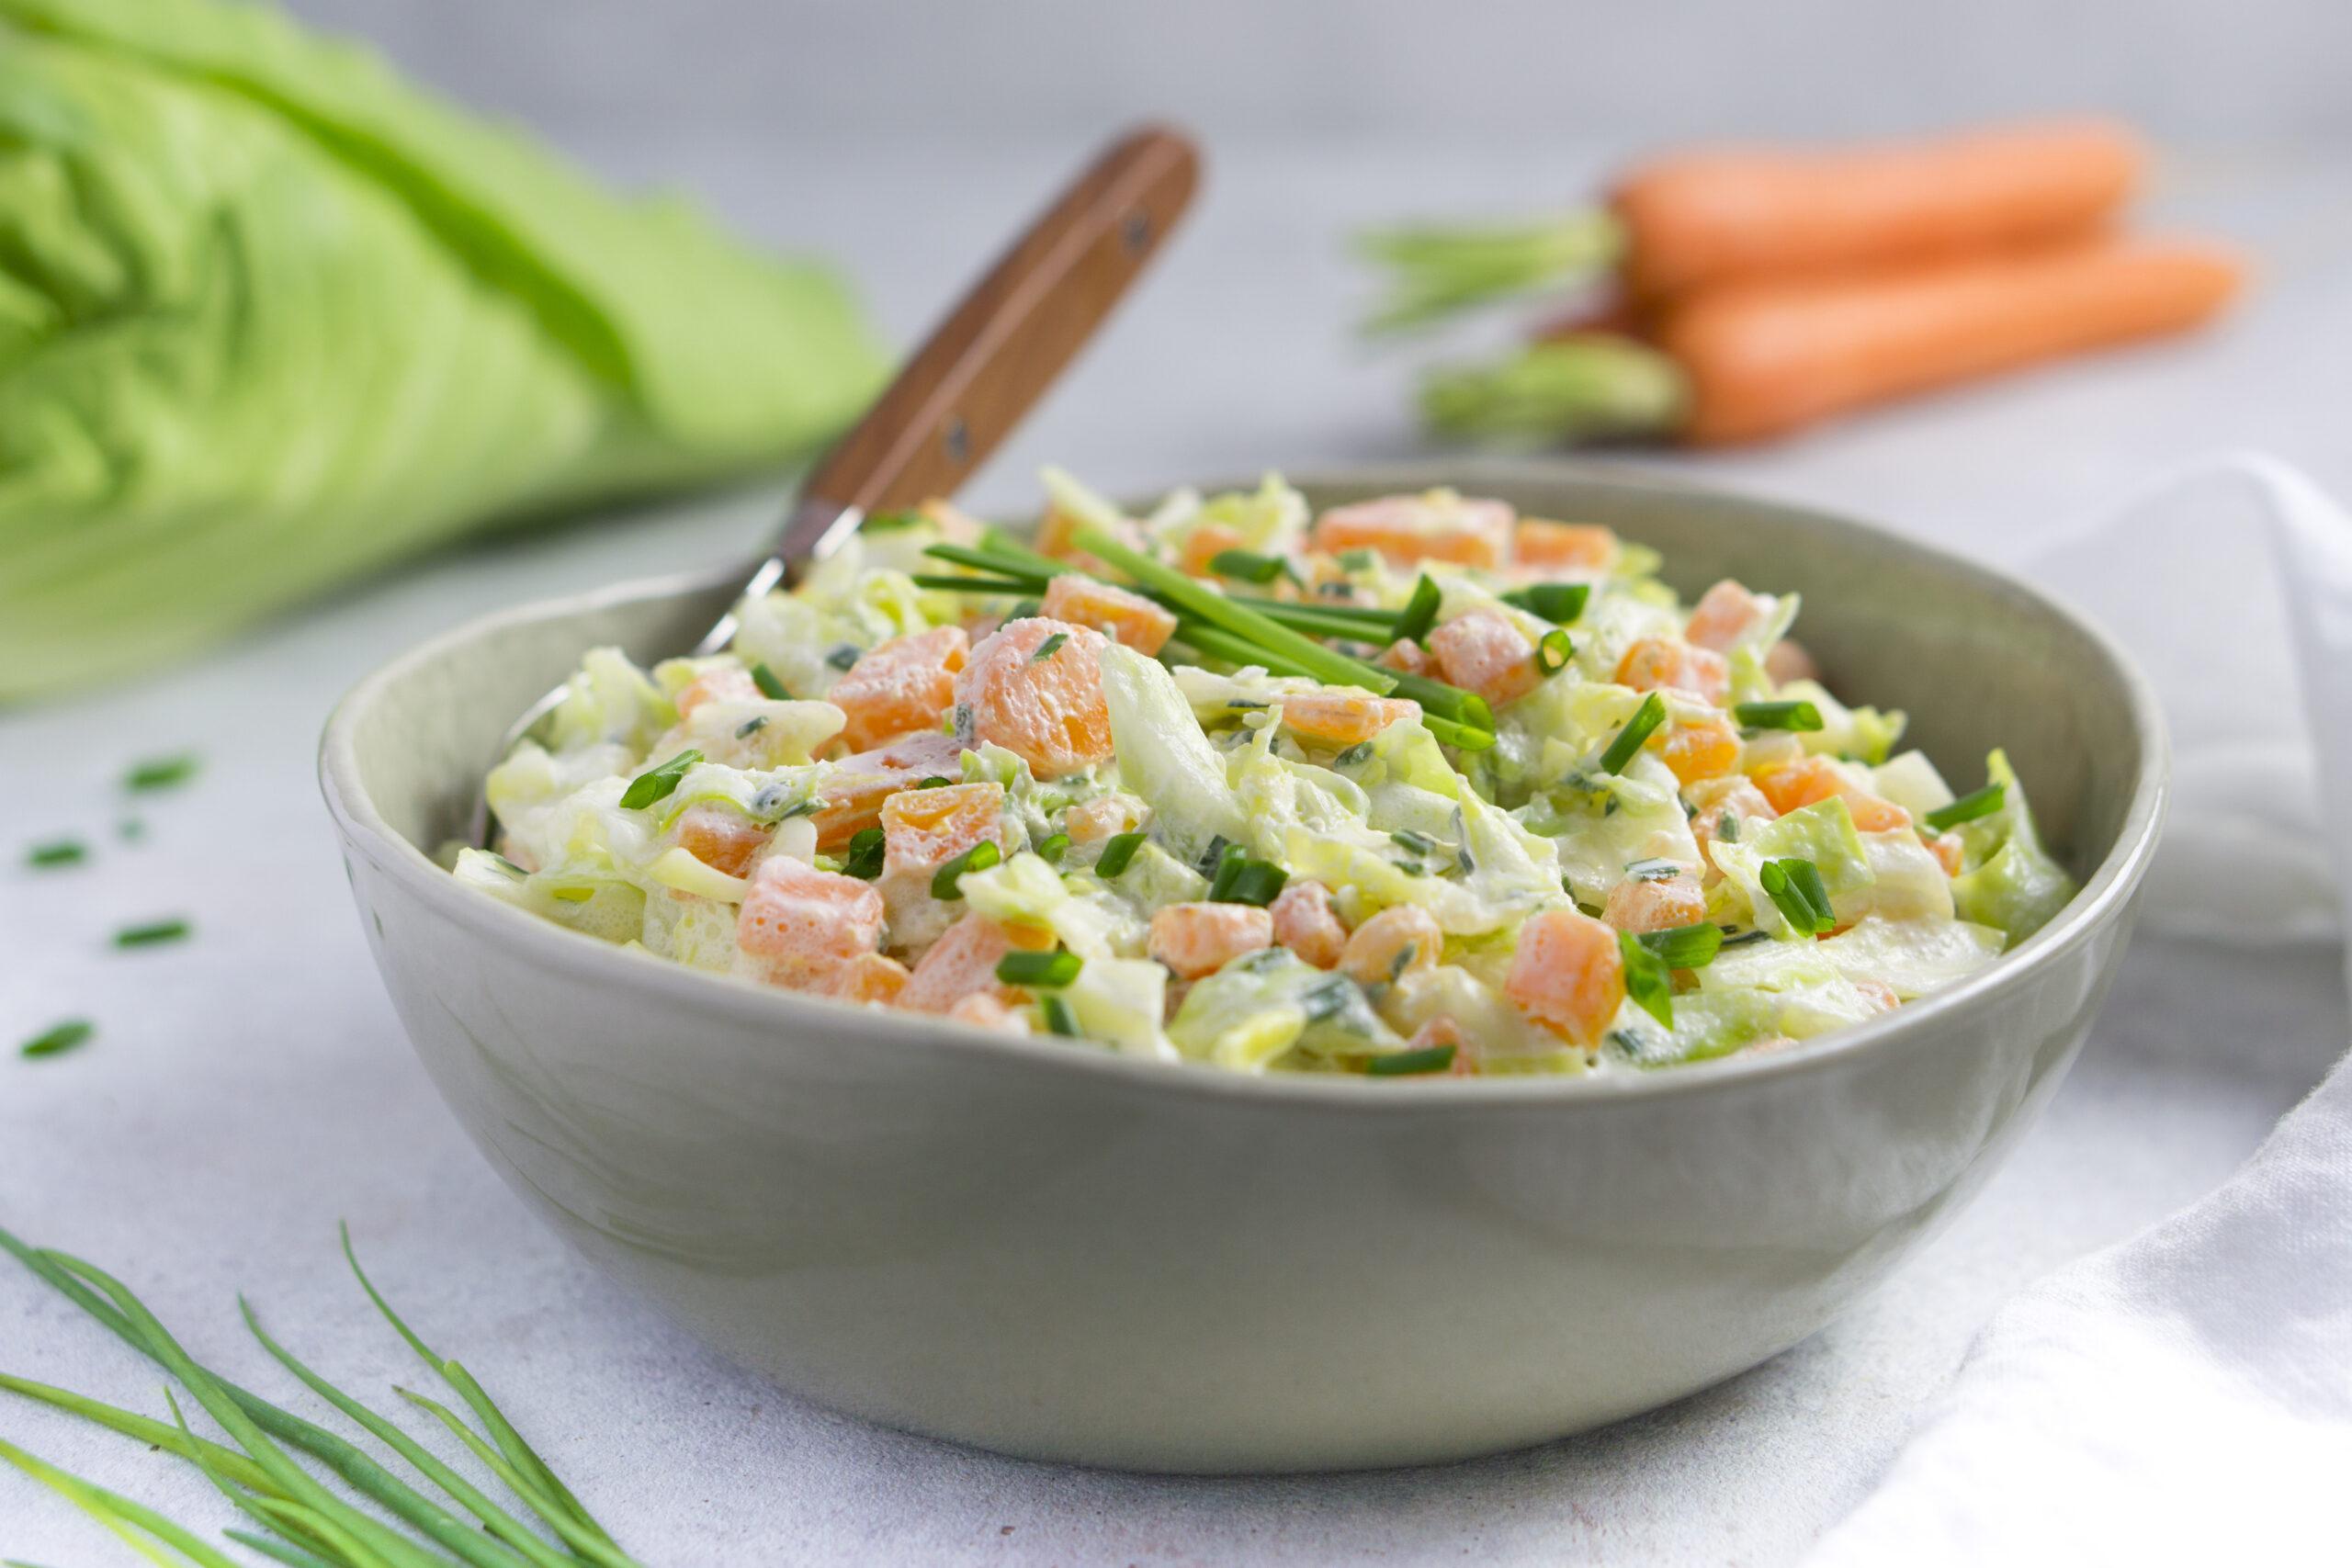 15 Minuten Krautsalat vom Spitzkohl-eat Tolerant